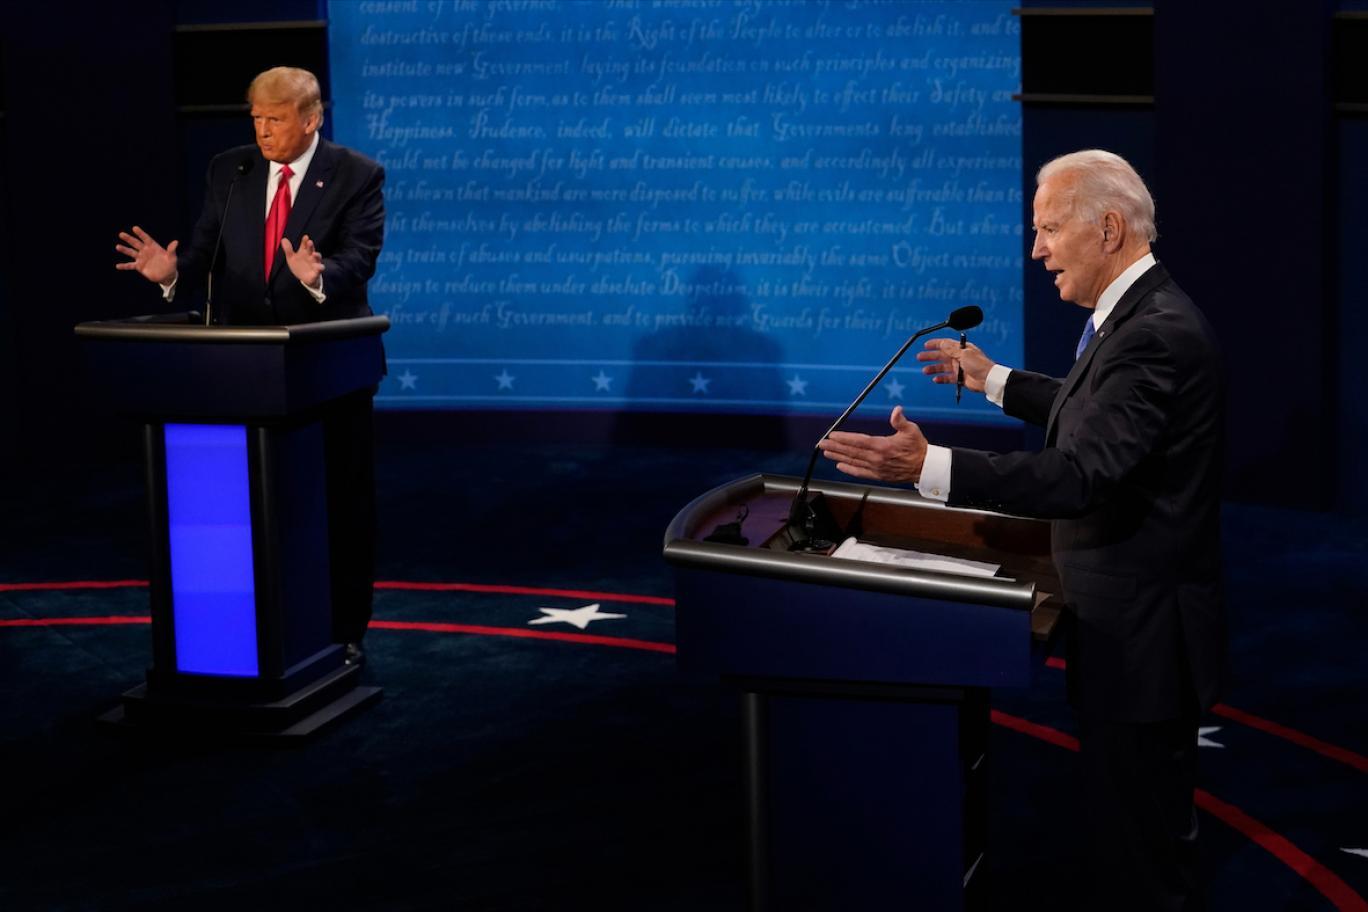 دو سناریوی غیرقابل پیشبینی: ایران و انتخابات آمریکا